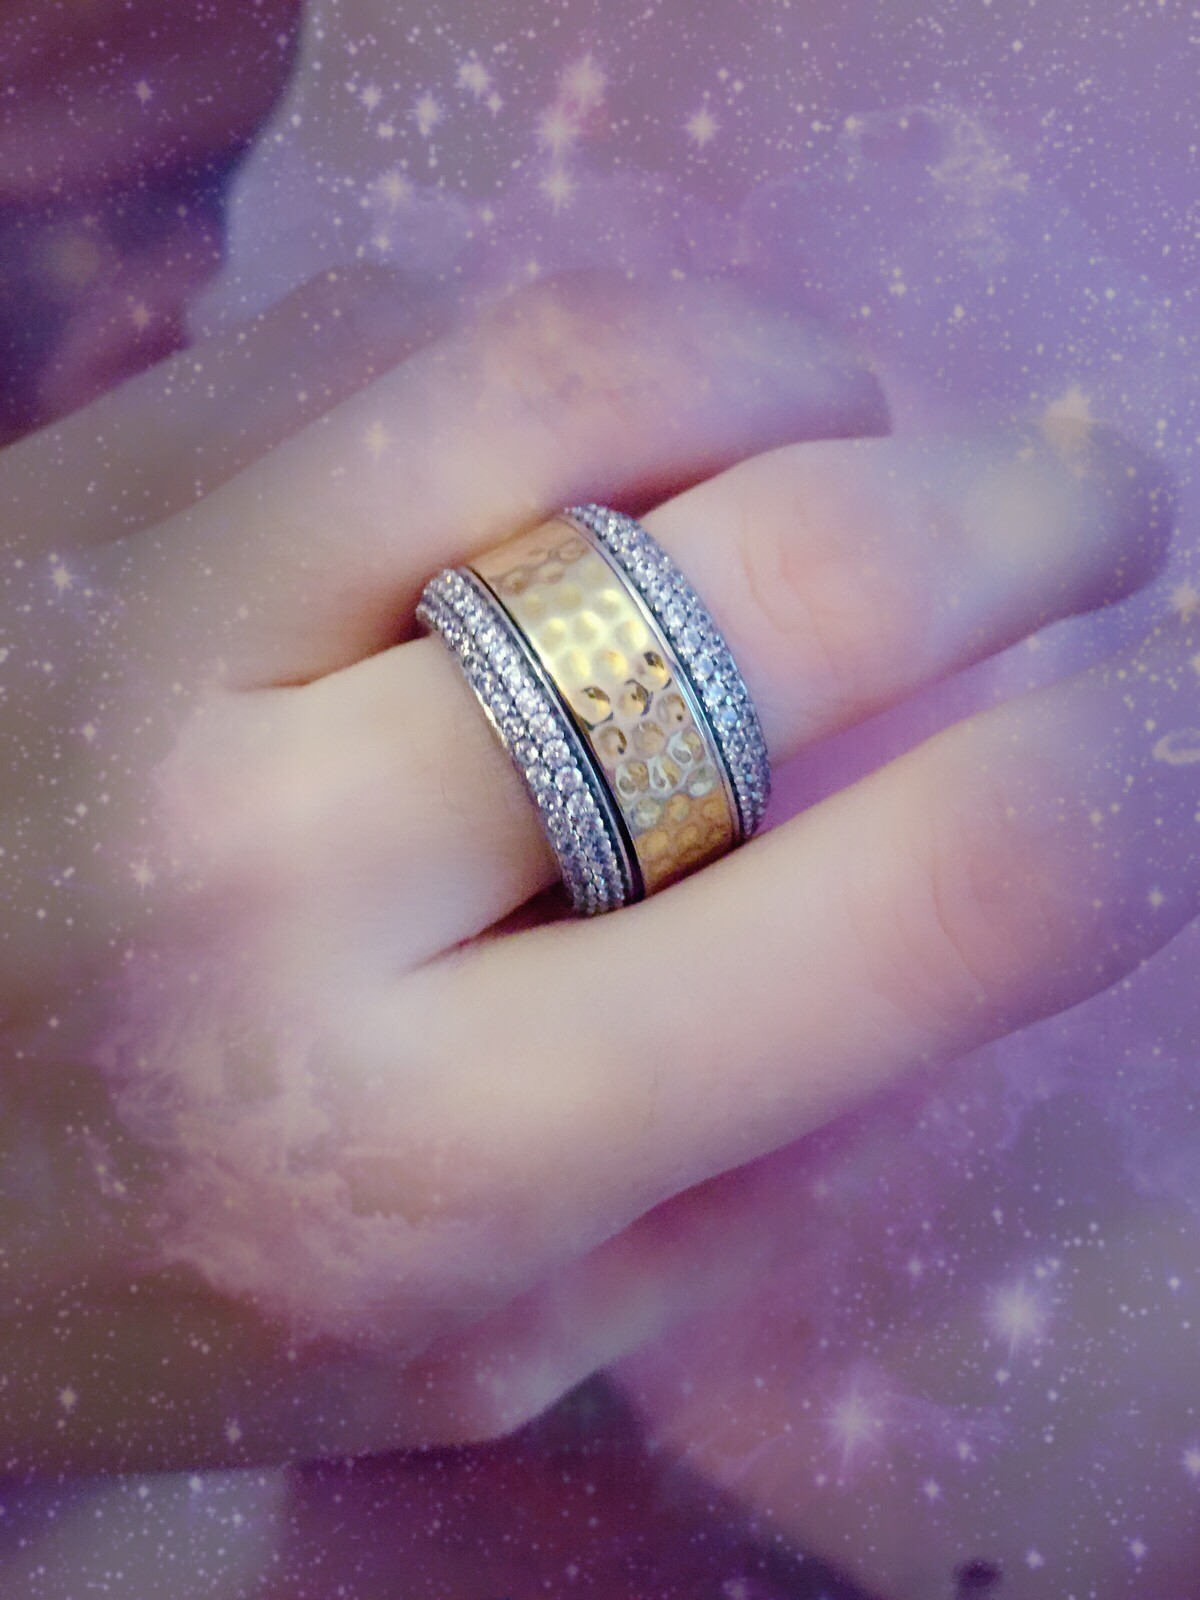 Шикарное кольцо!!!!!!!!